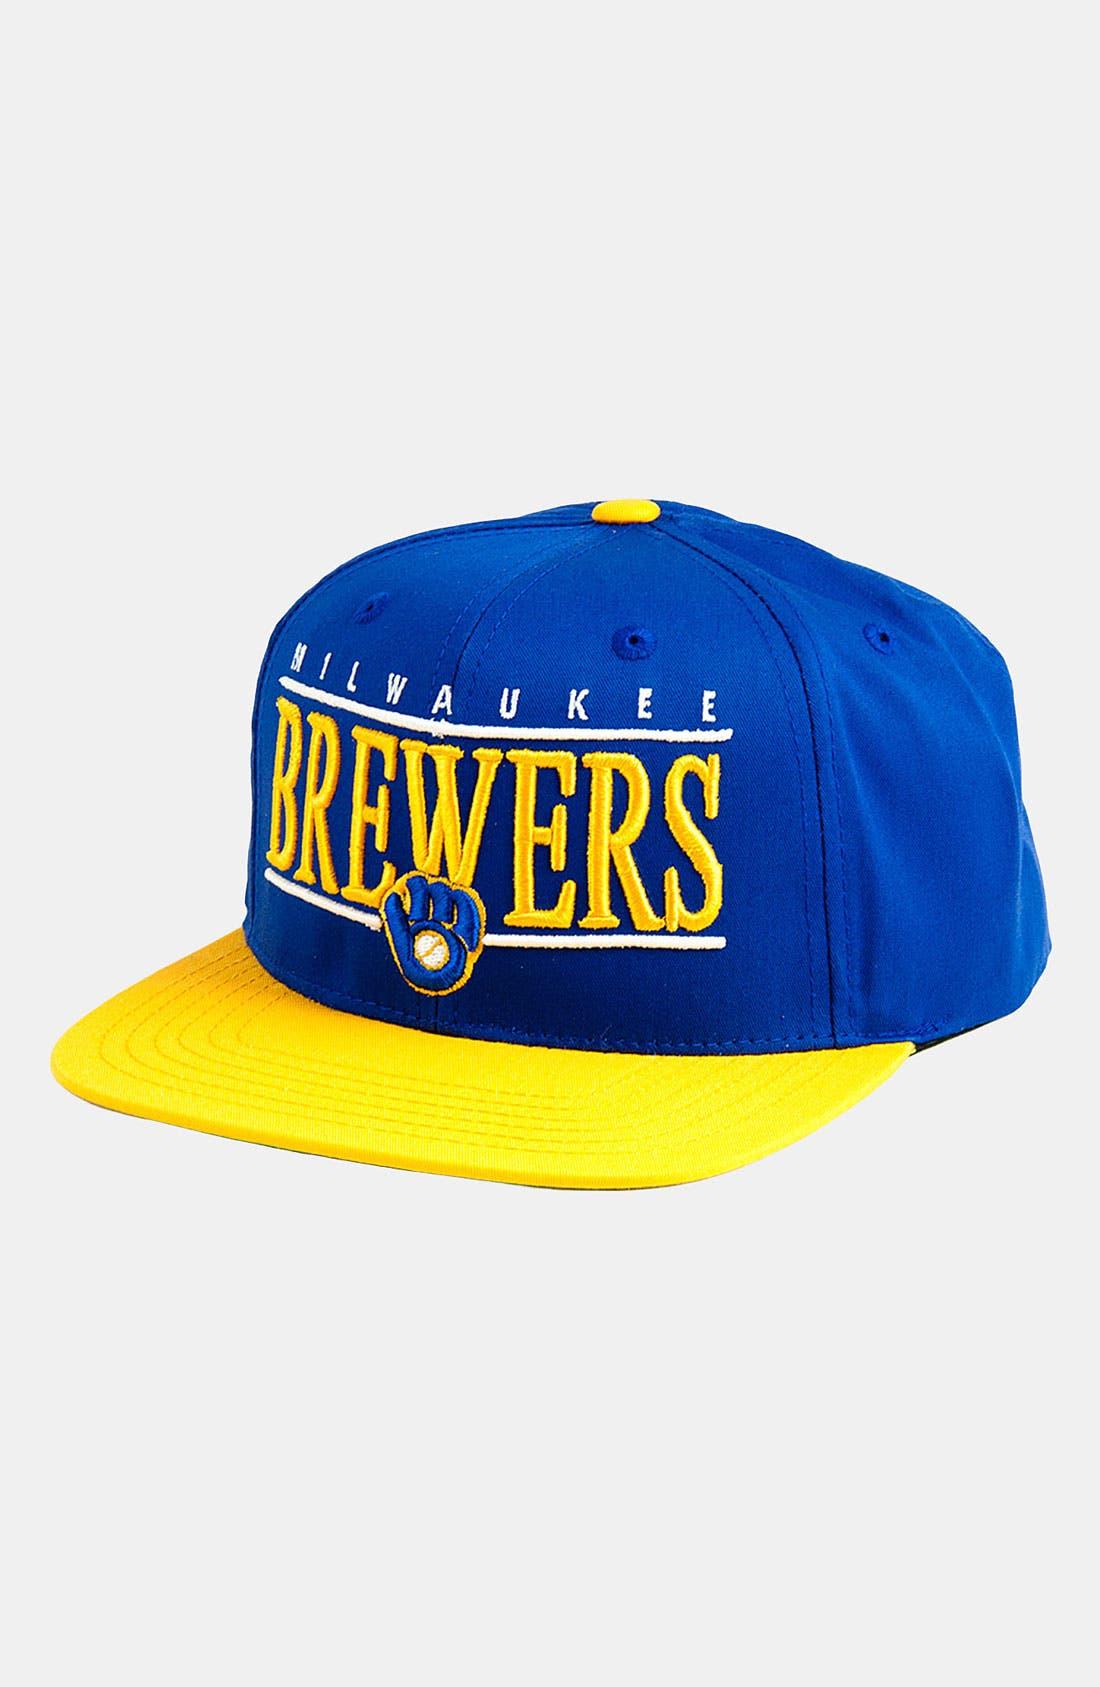 Main Image - American Needle 'Milwaukee Brewers - Nineties' Twill Snapback Baseball Cap